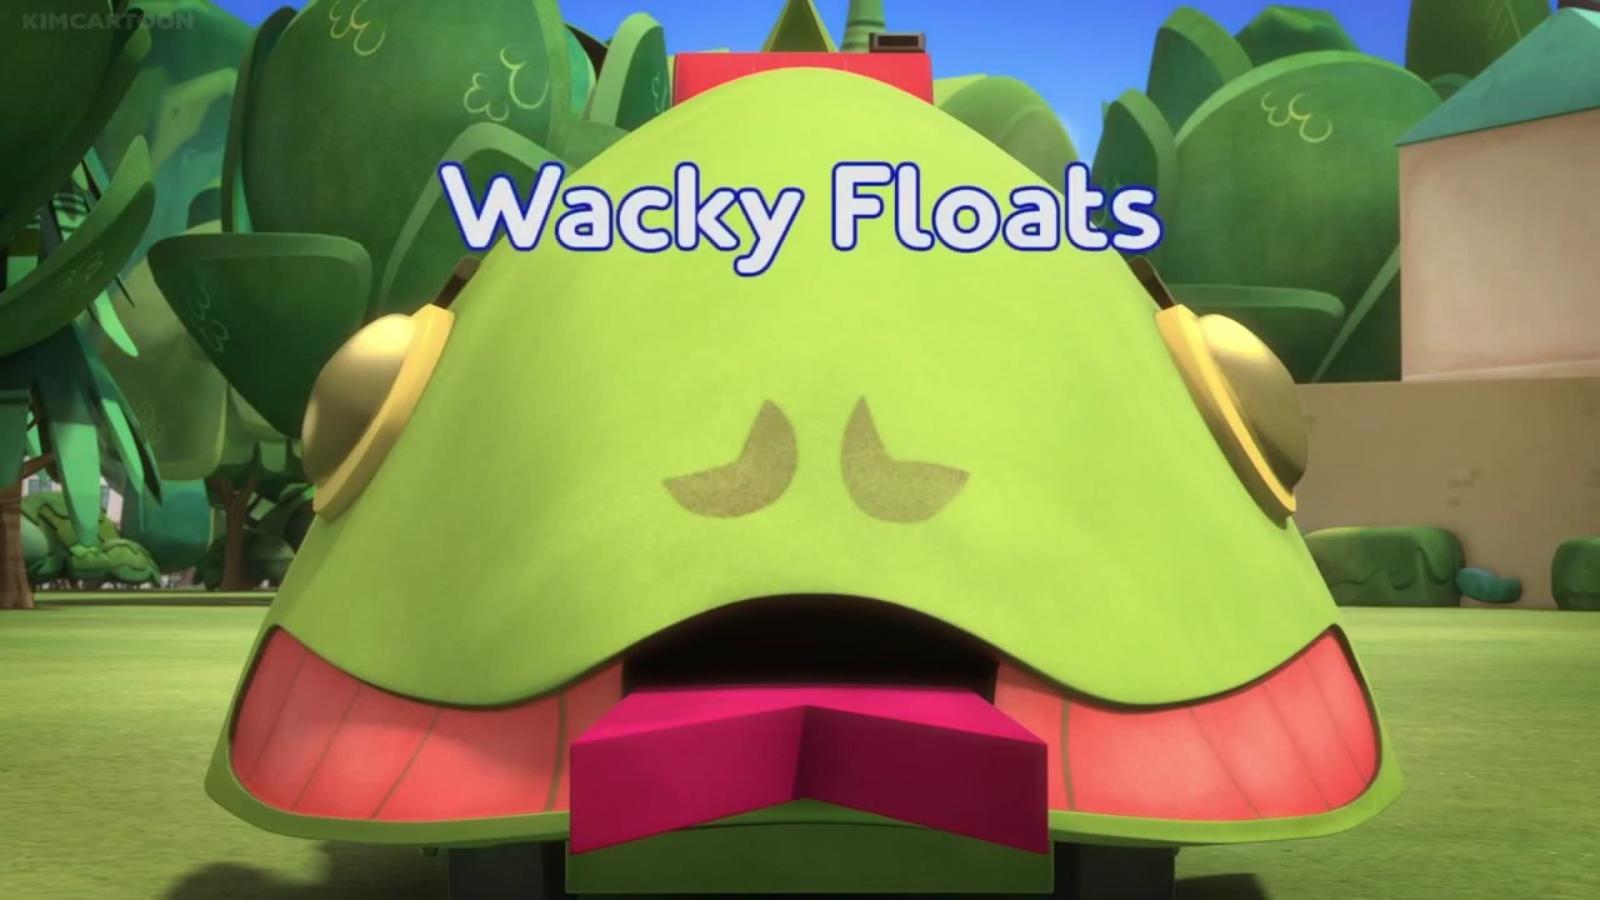 Wacky Floats